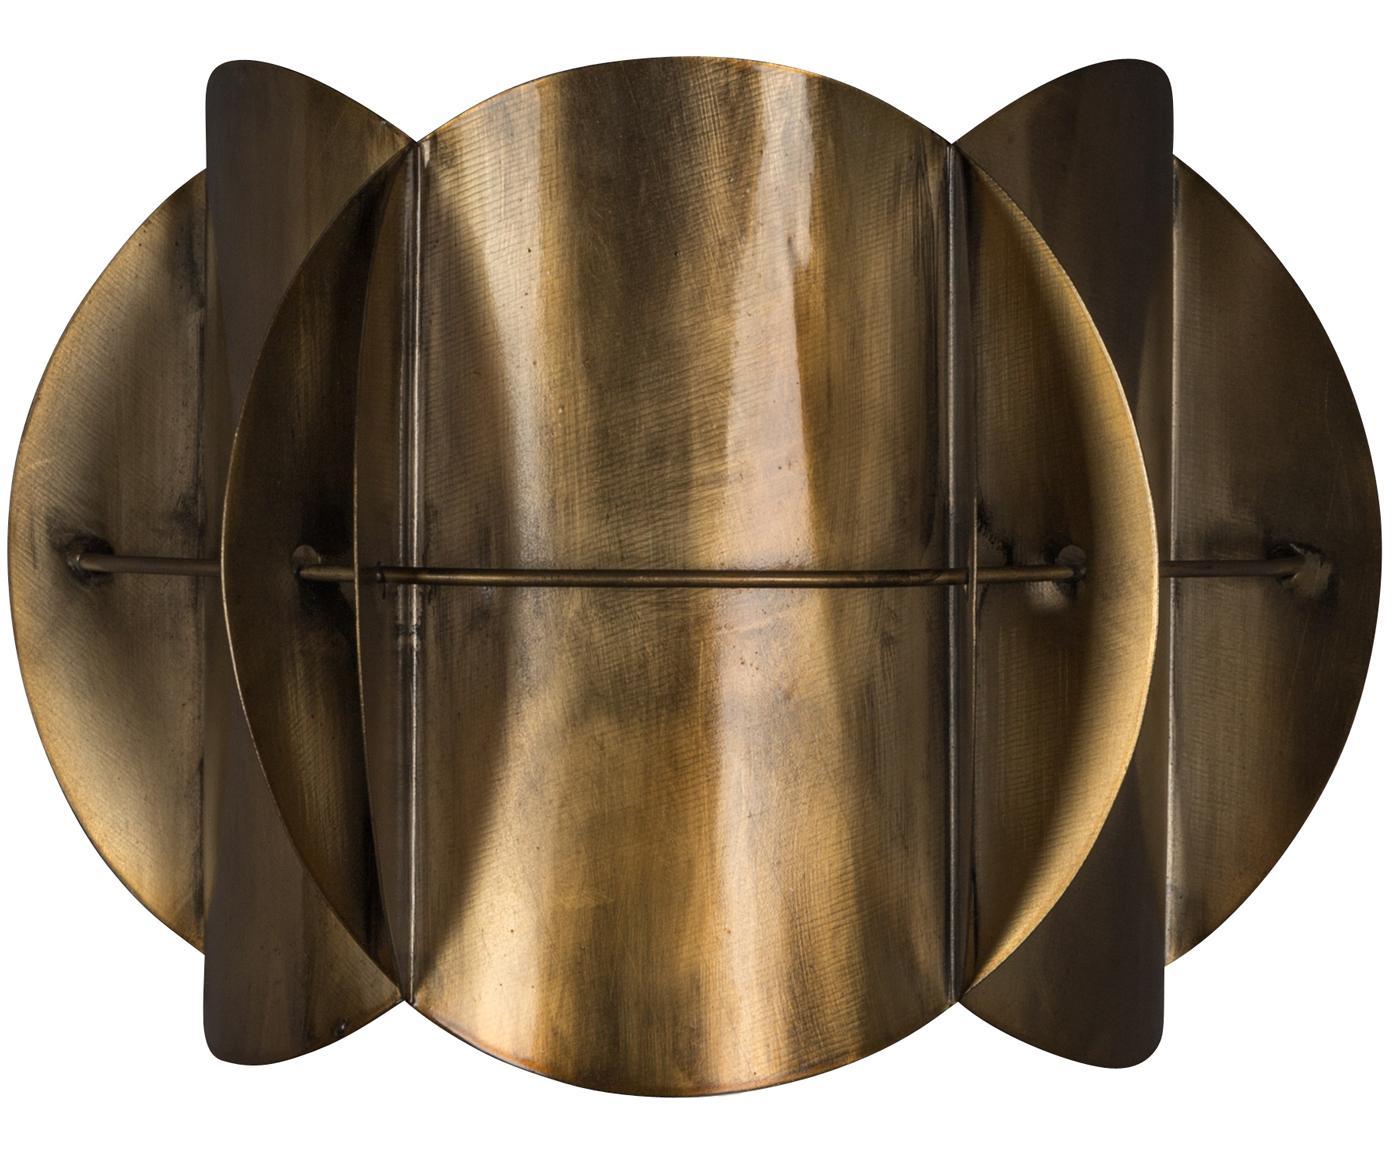 Wandleuchte Corridor, Lampenschirm: Messing, Messing mit Antik-Finish, 27 x 19 cm